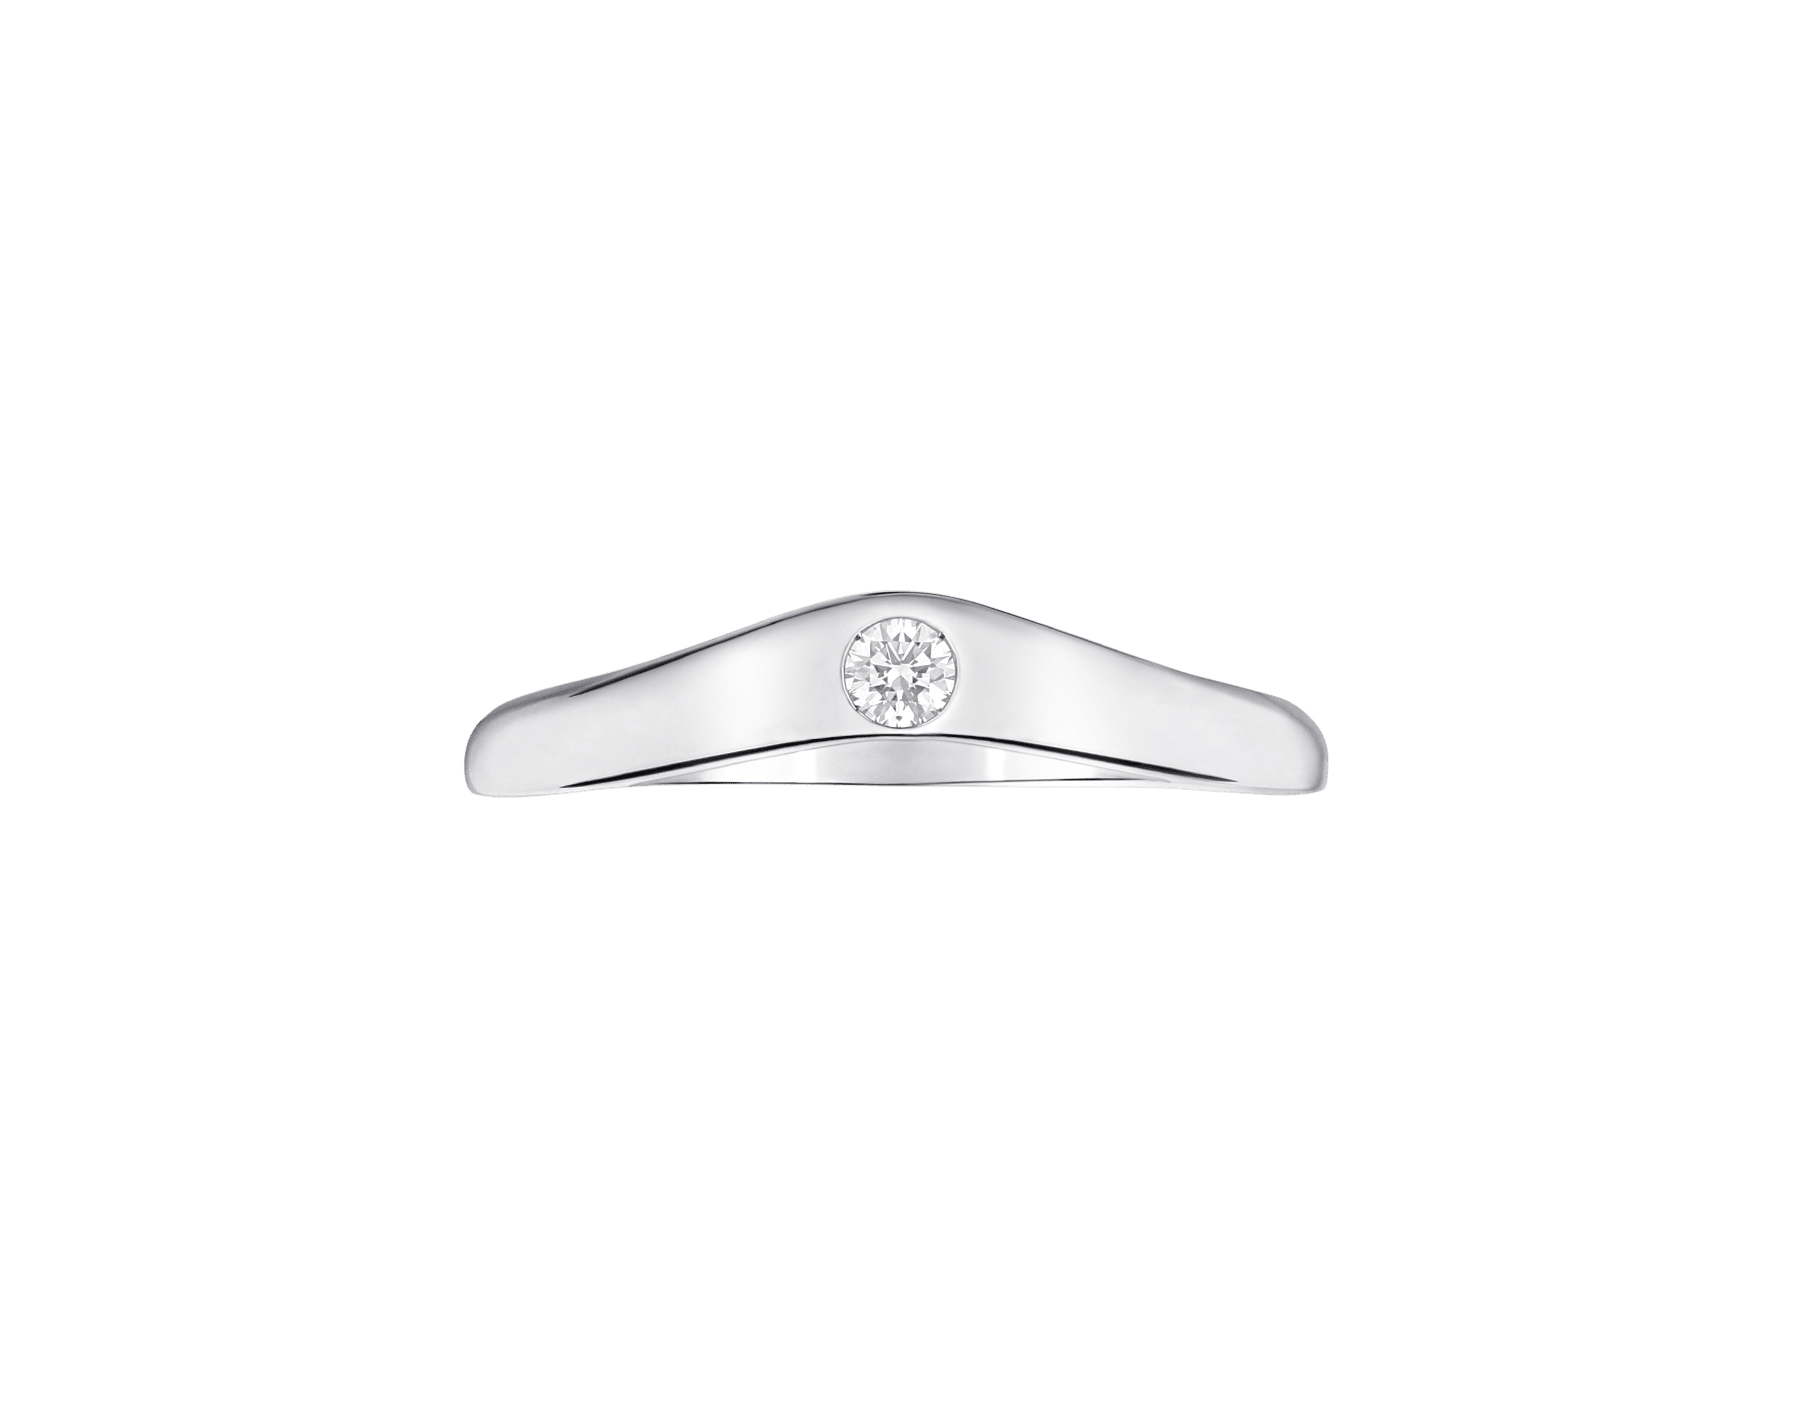 Corona platinum wedding band, set with a diamond. AN856296 image 3